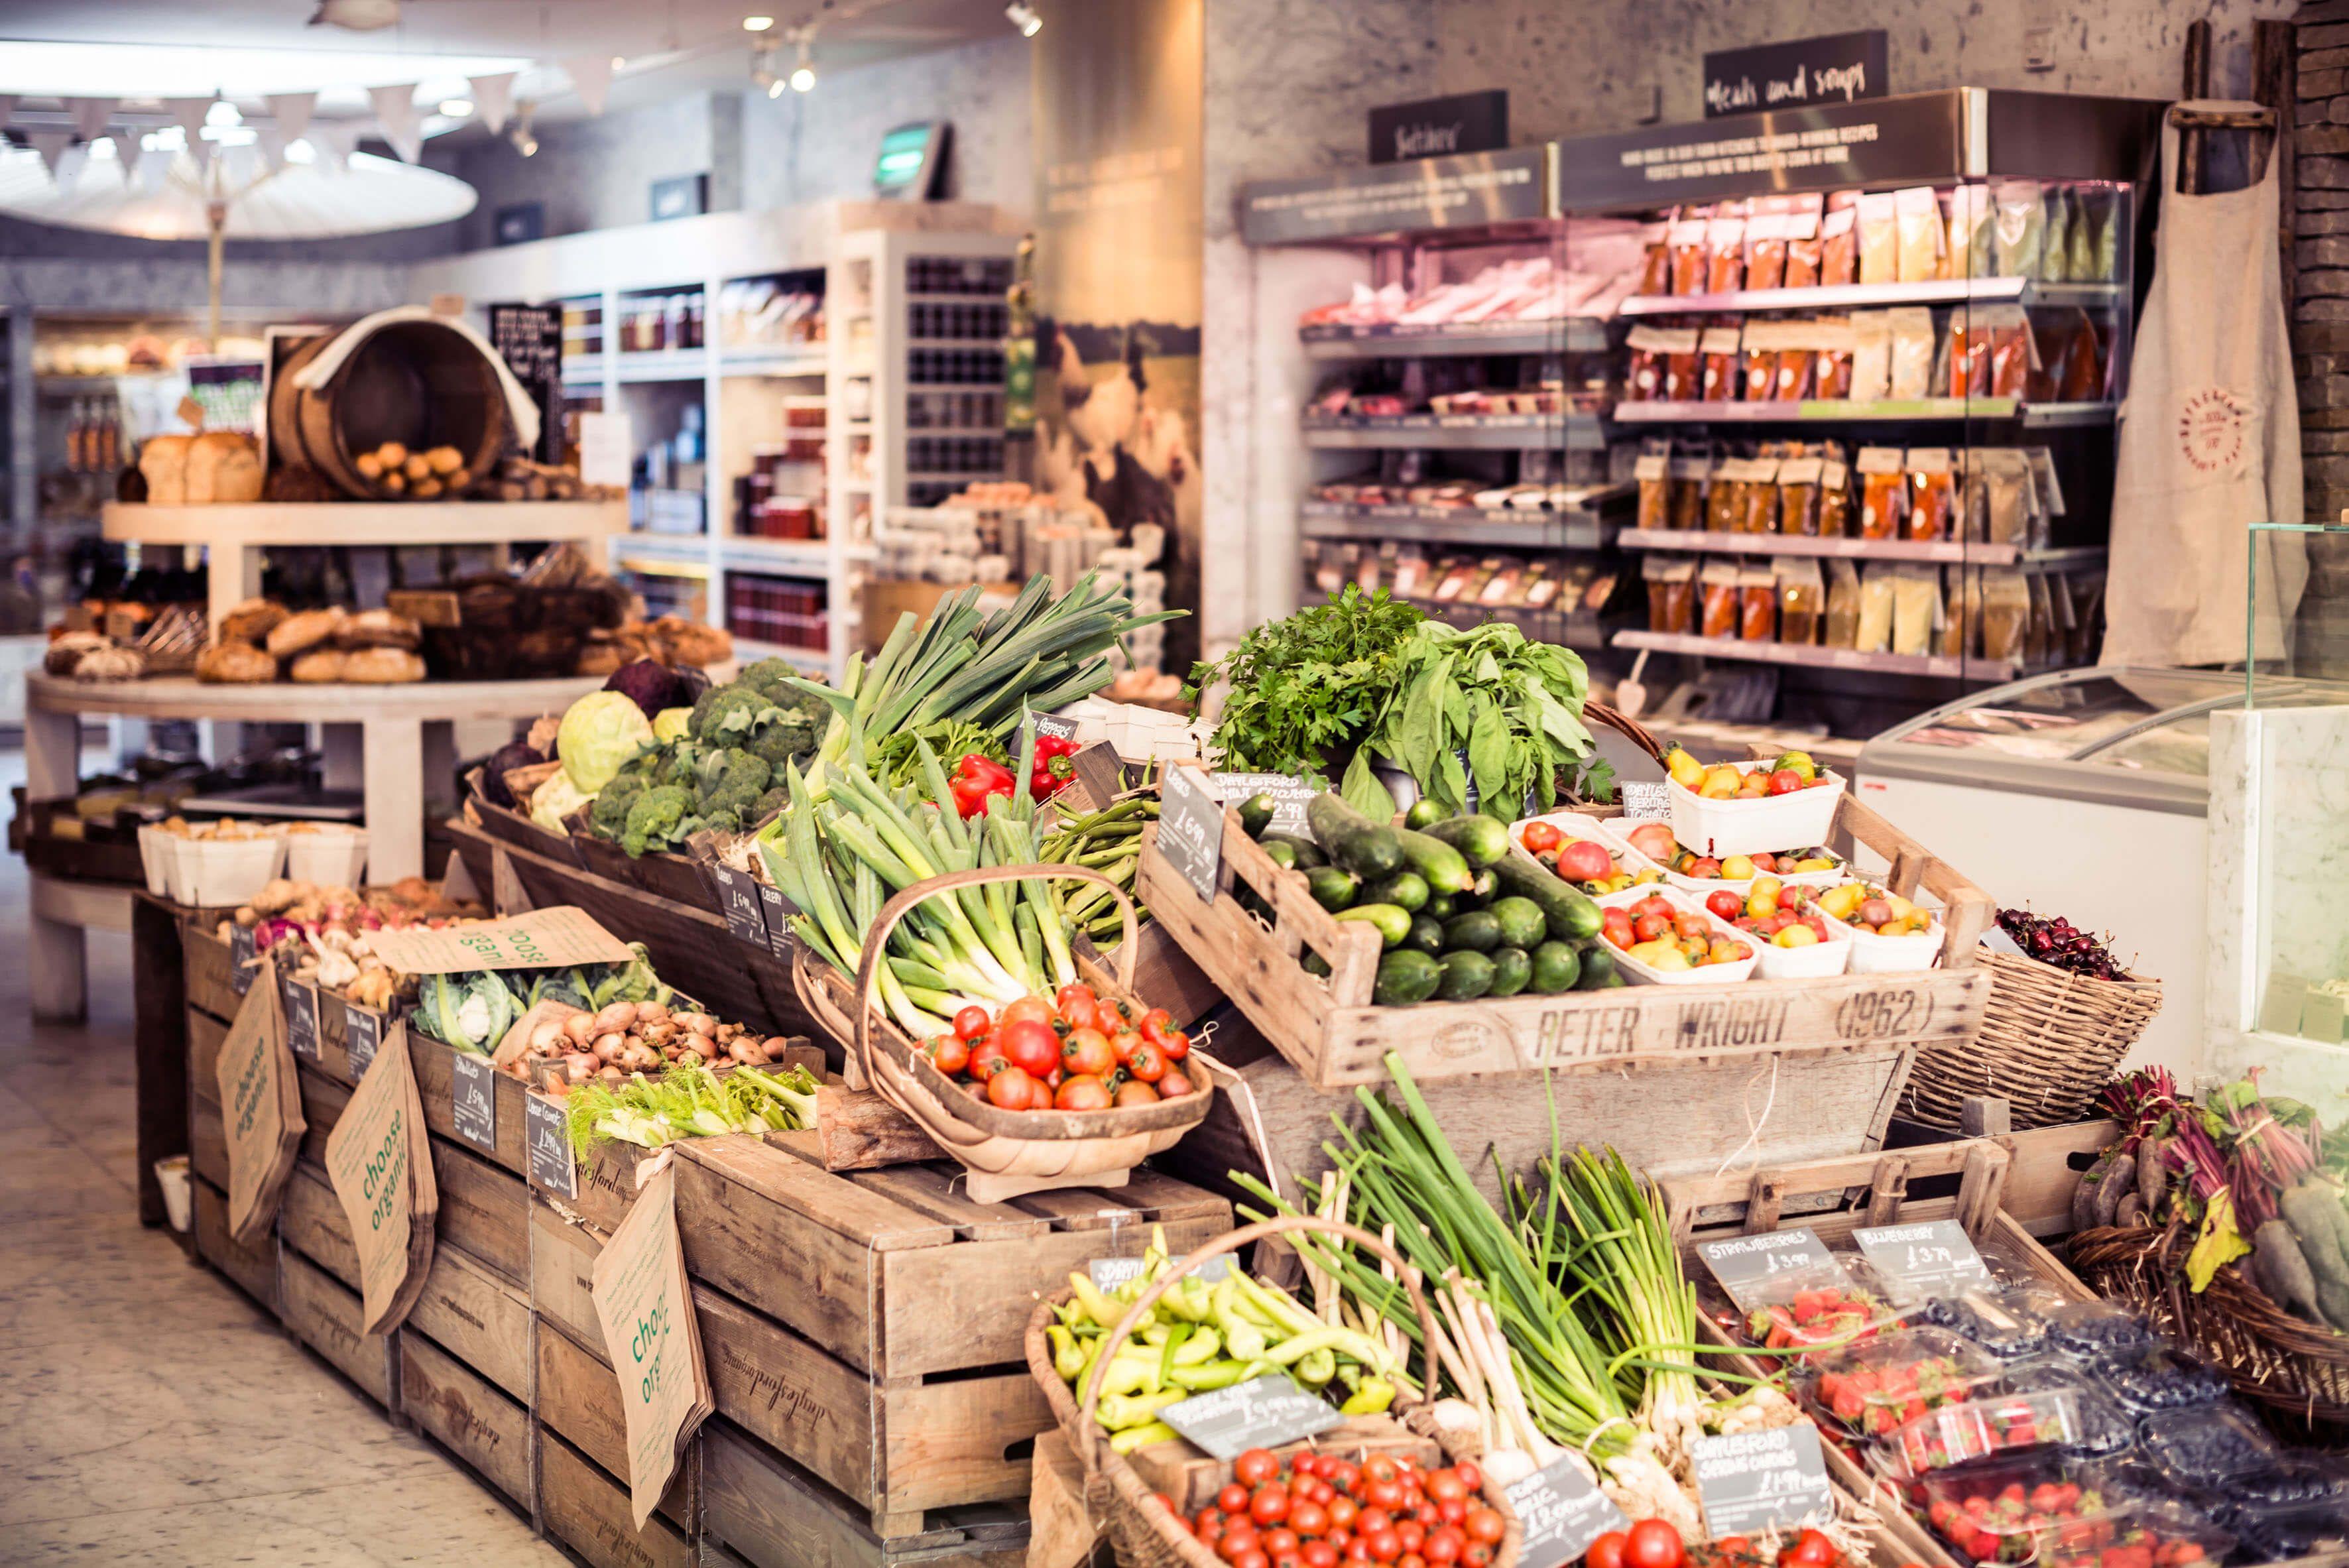 Daylesford Gloucestershire, UK Vegetable shop